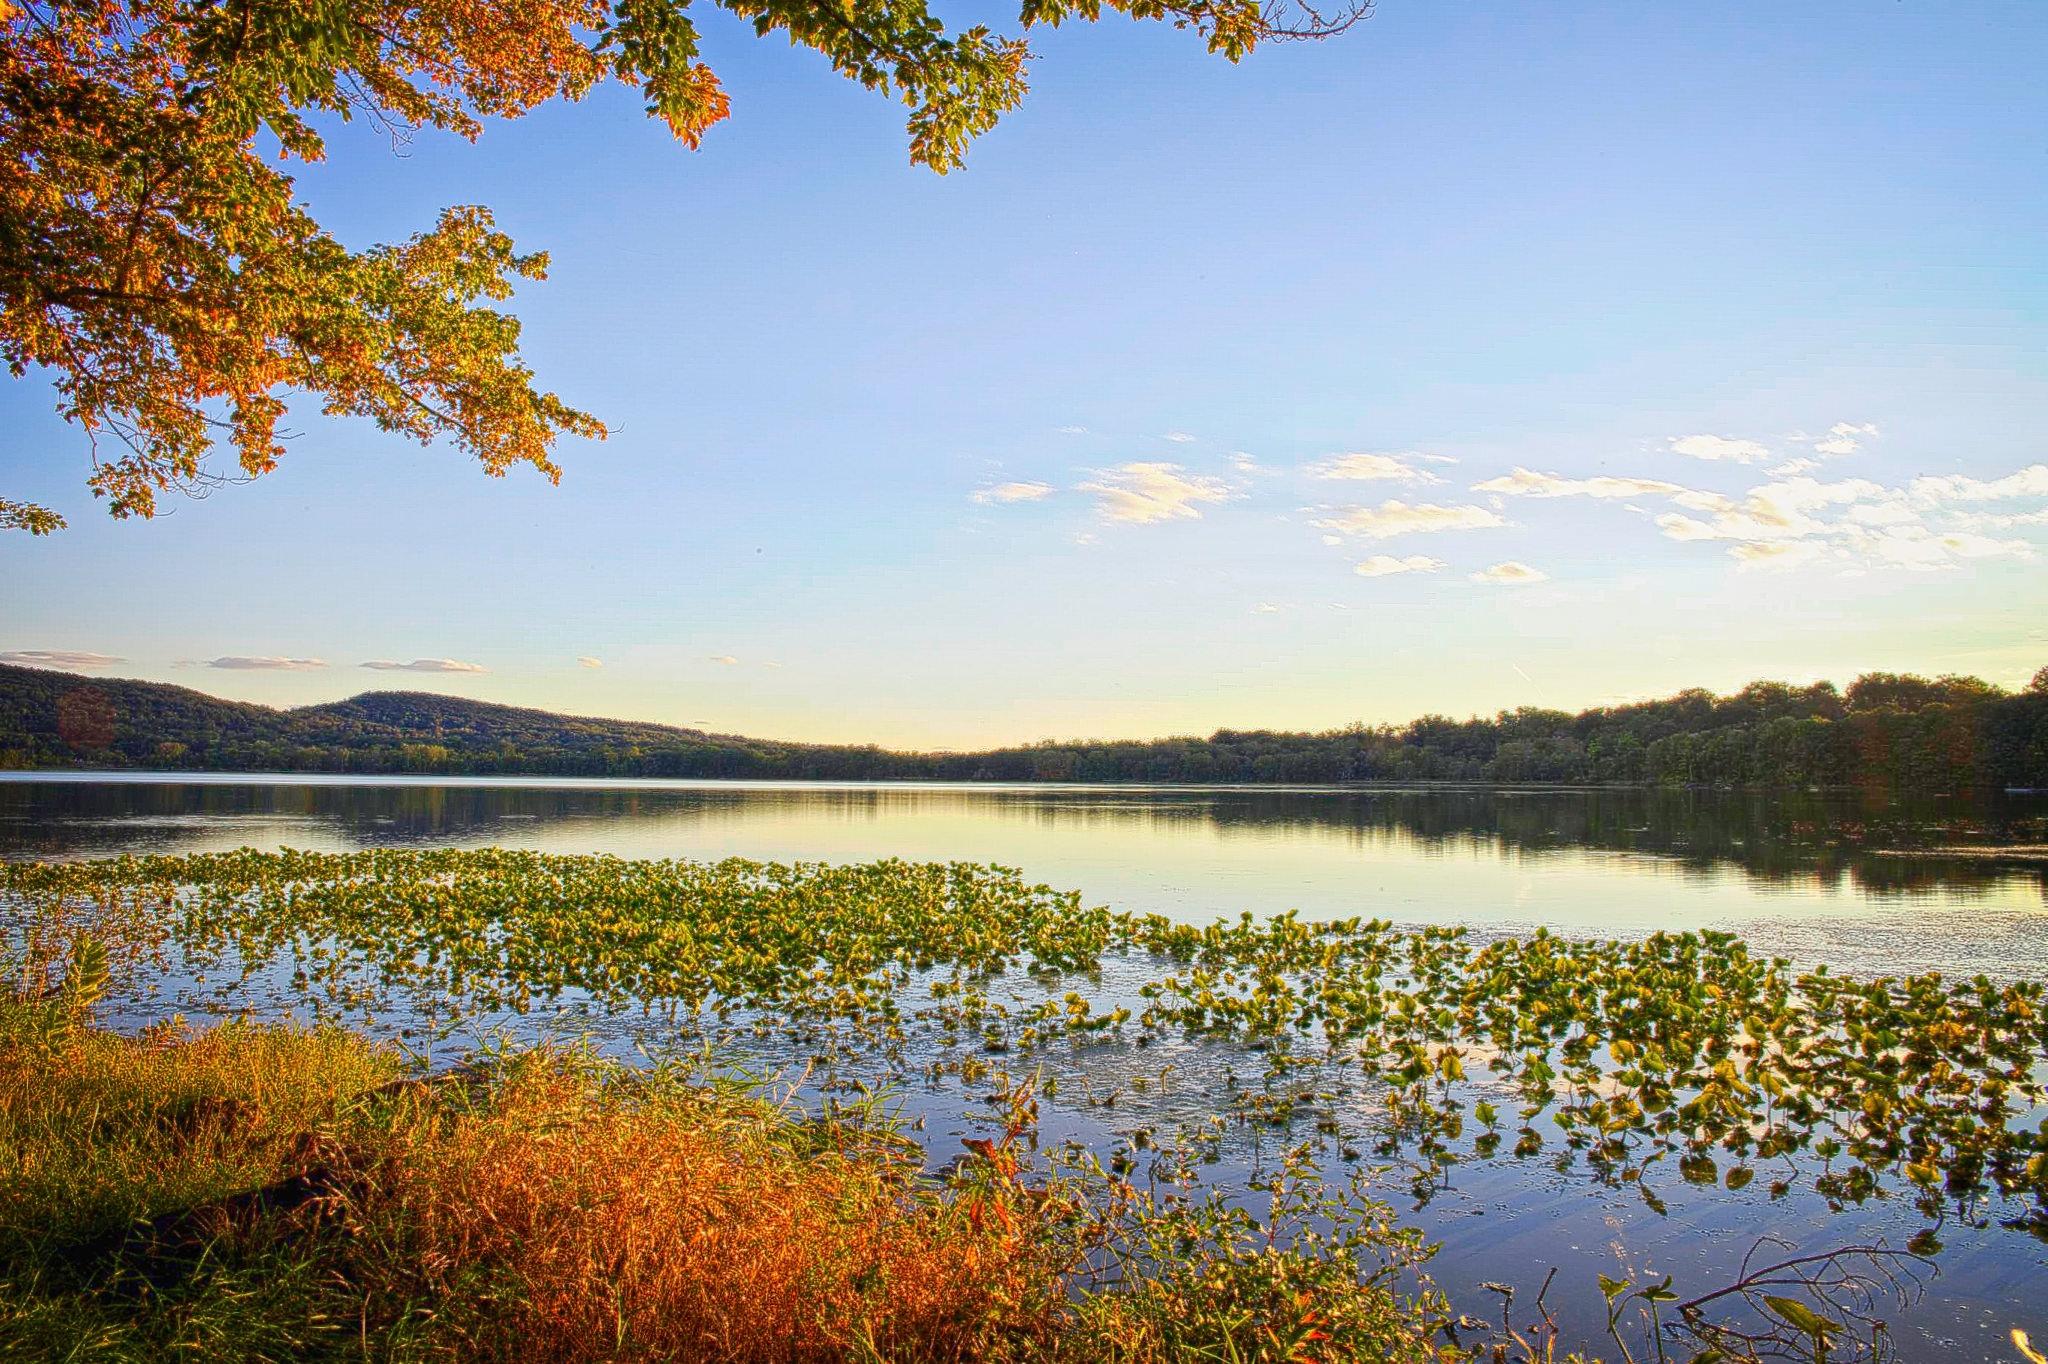 Lake Congers